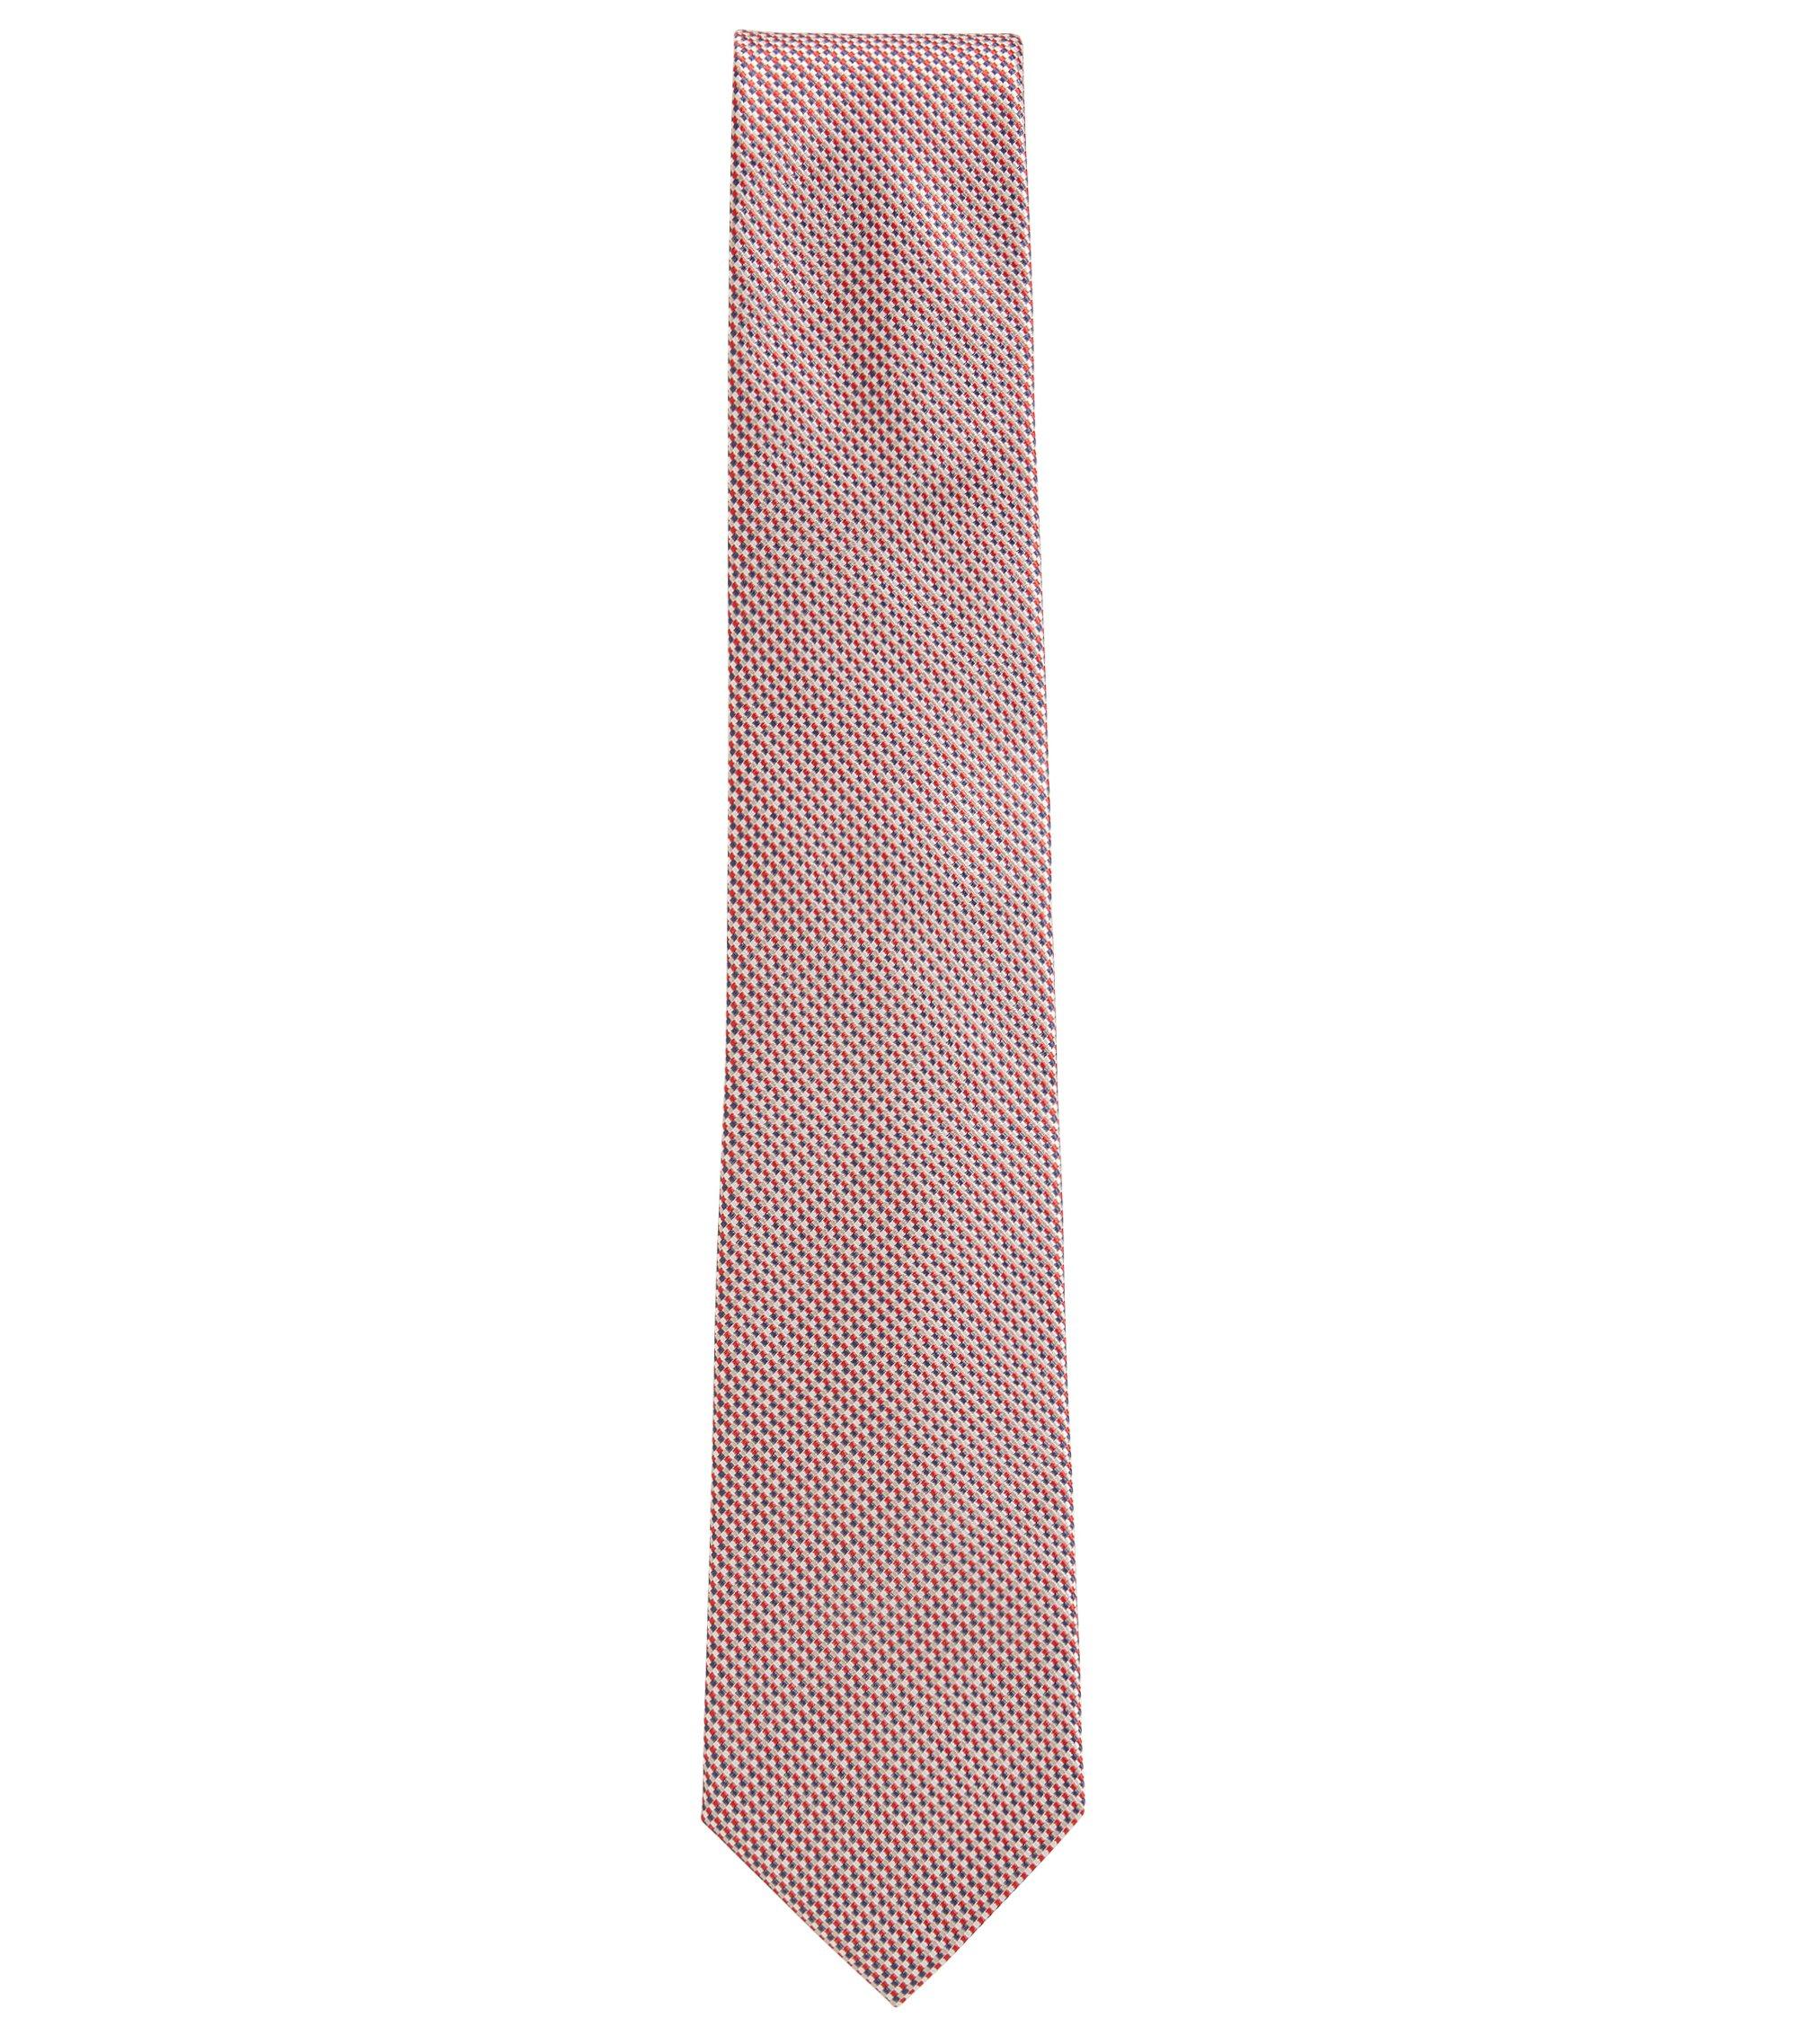 Micro-Patterned Italian Silk Tie, Dark pink